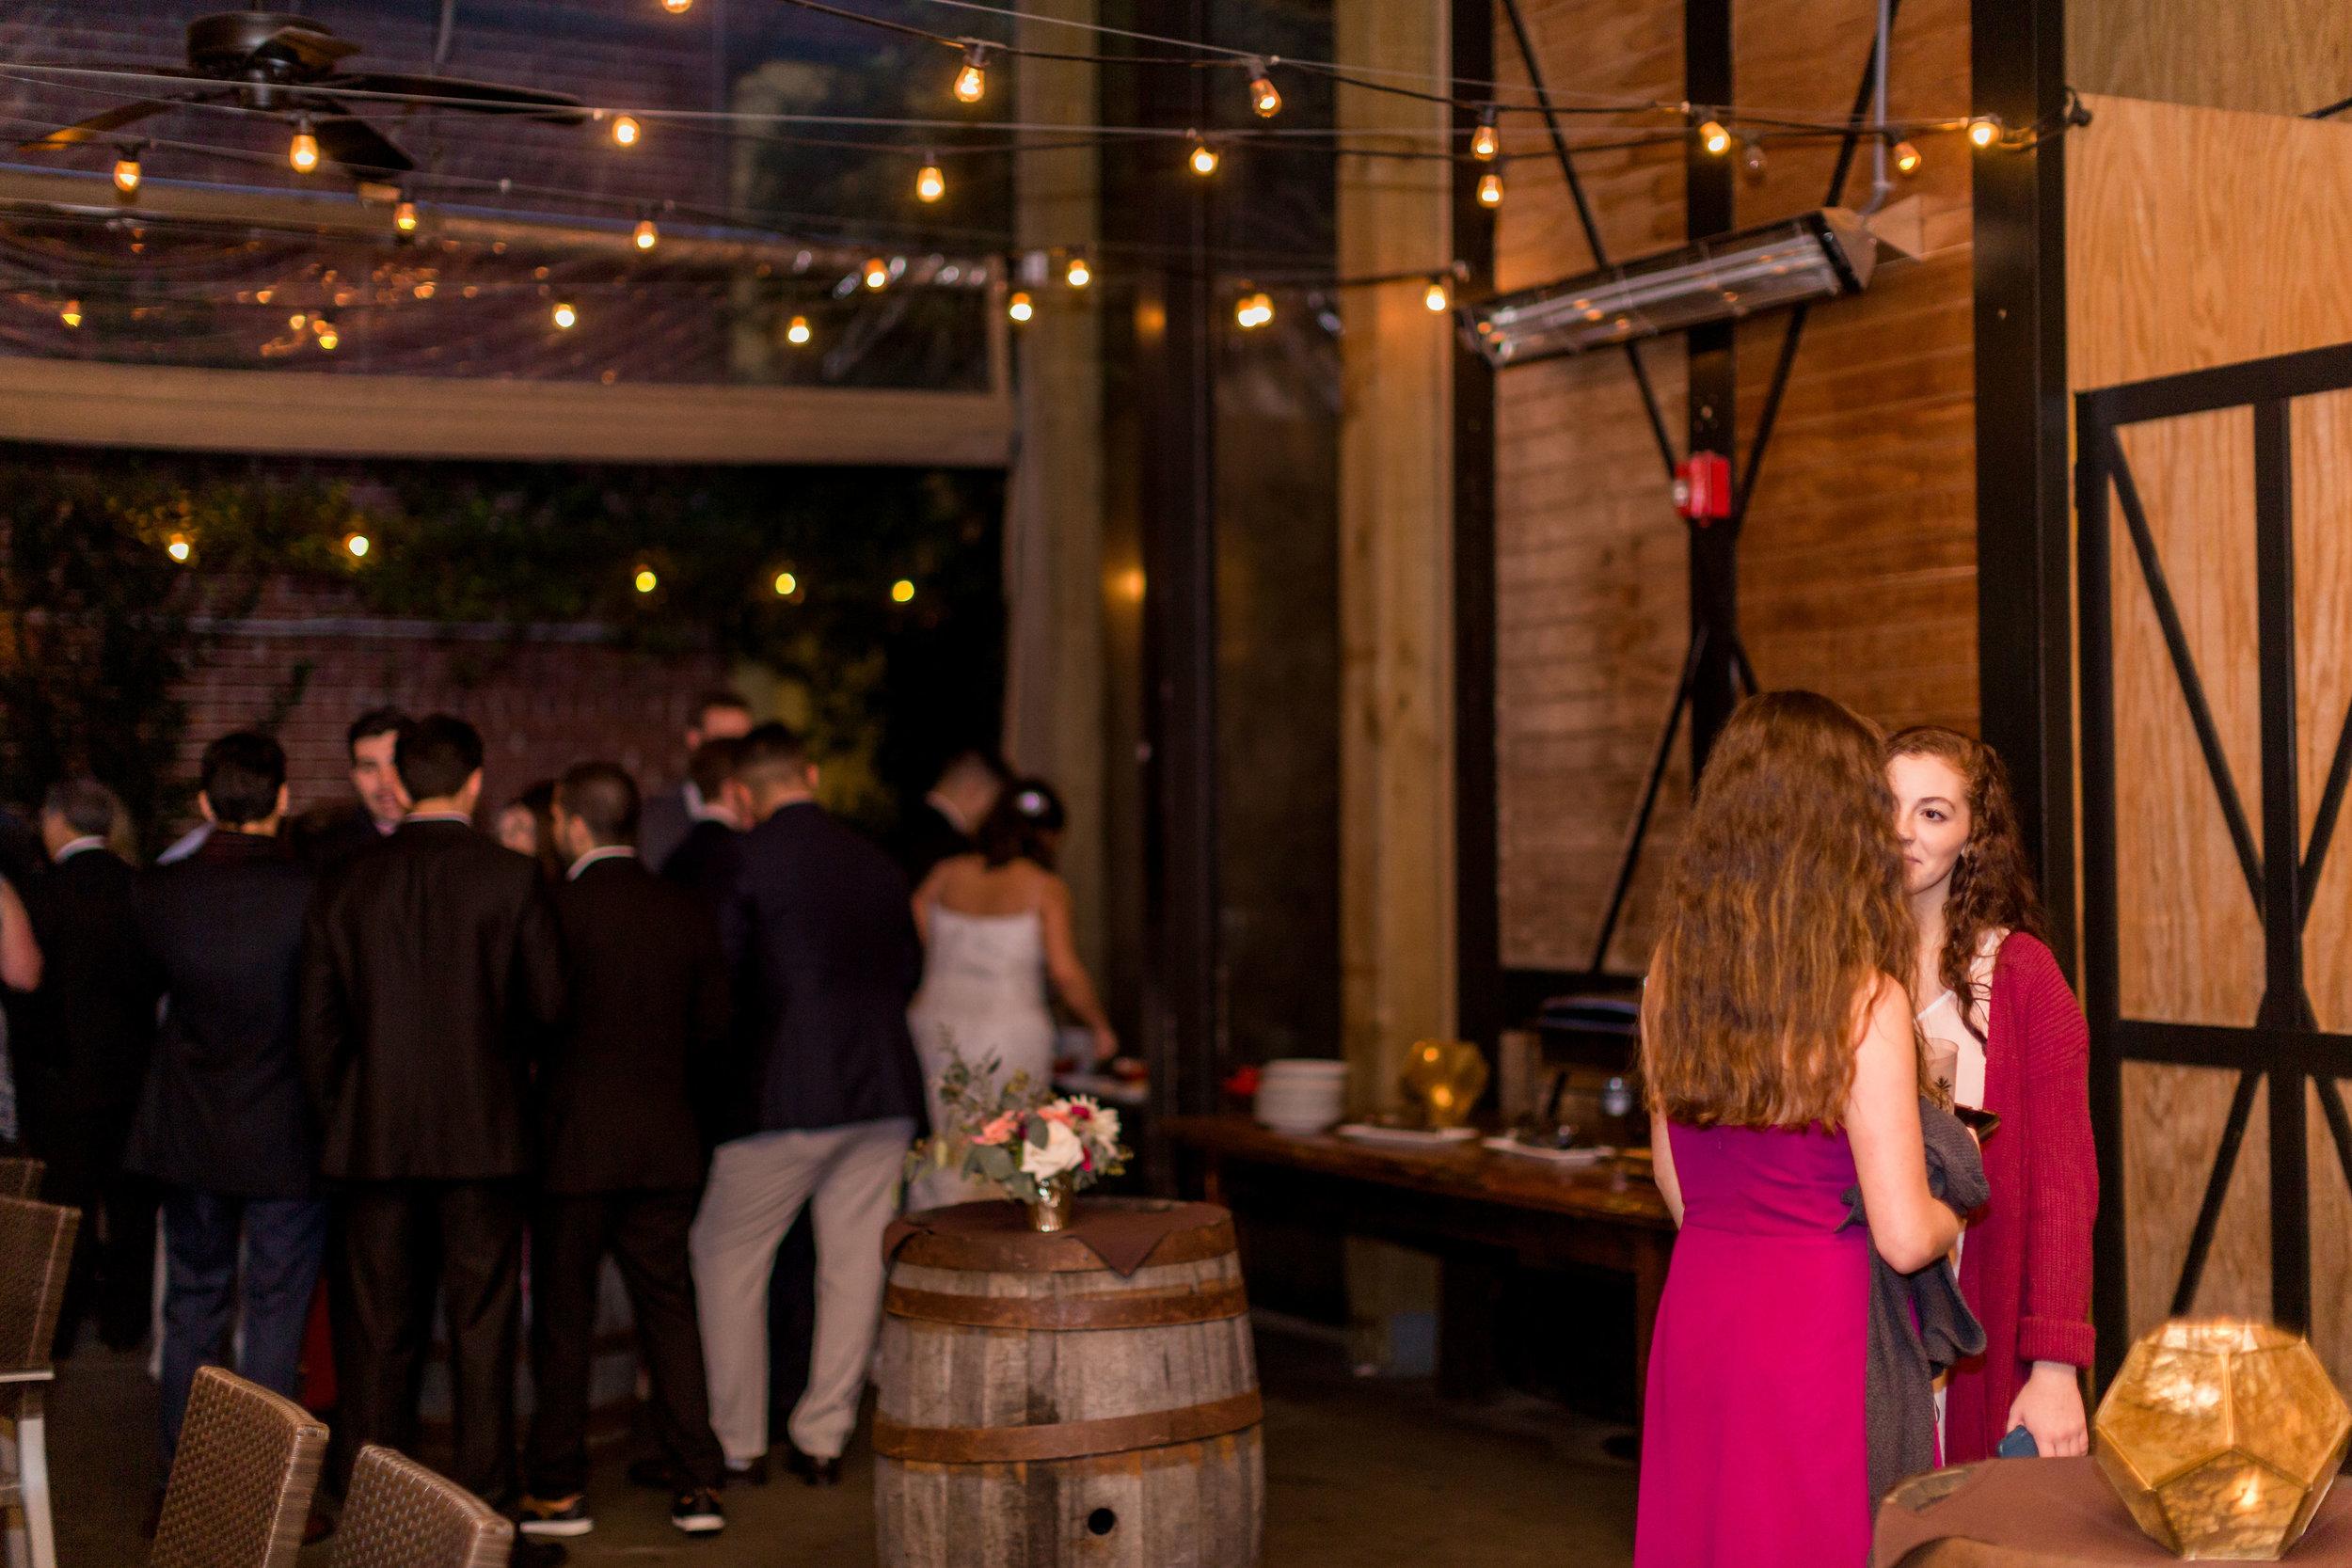 charleston new years elopement popup surprise wedding at upstairs at midtown - scarlet plan & design wedding planners (352).jpg